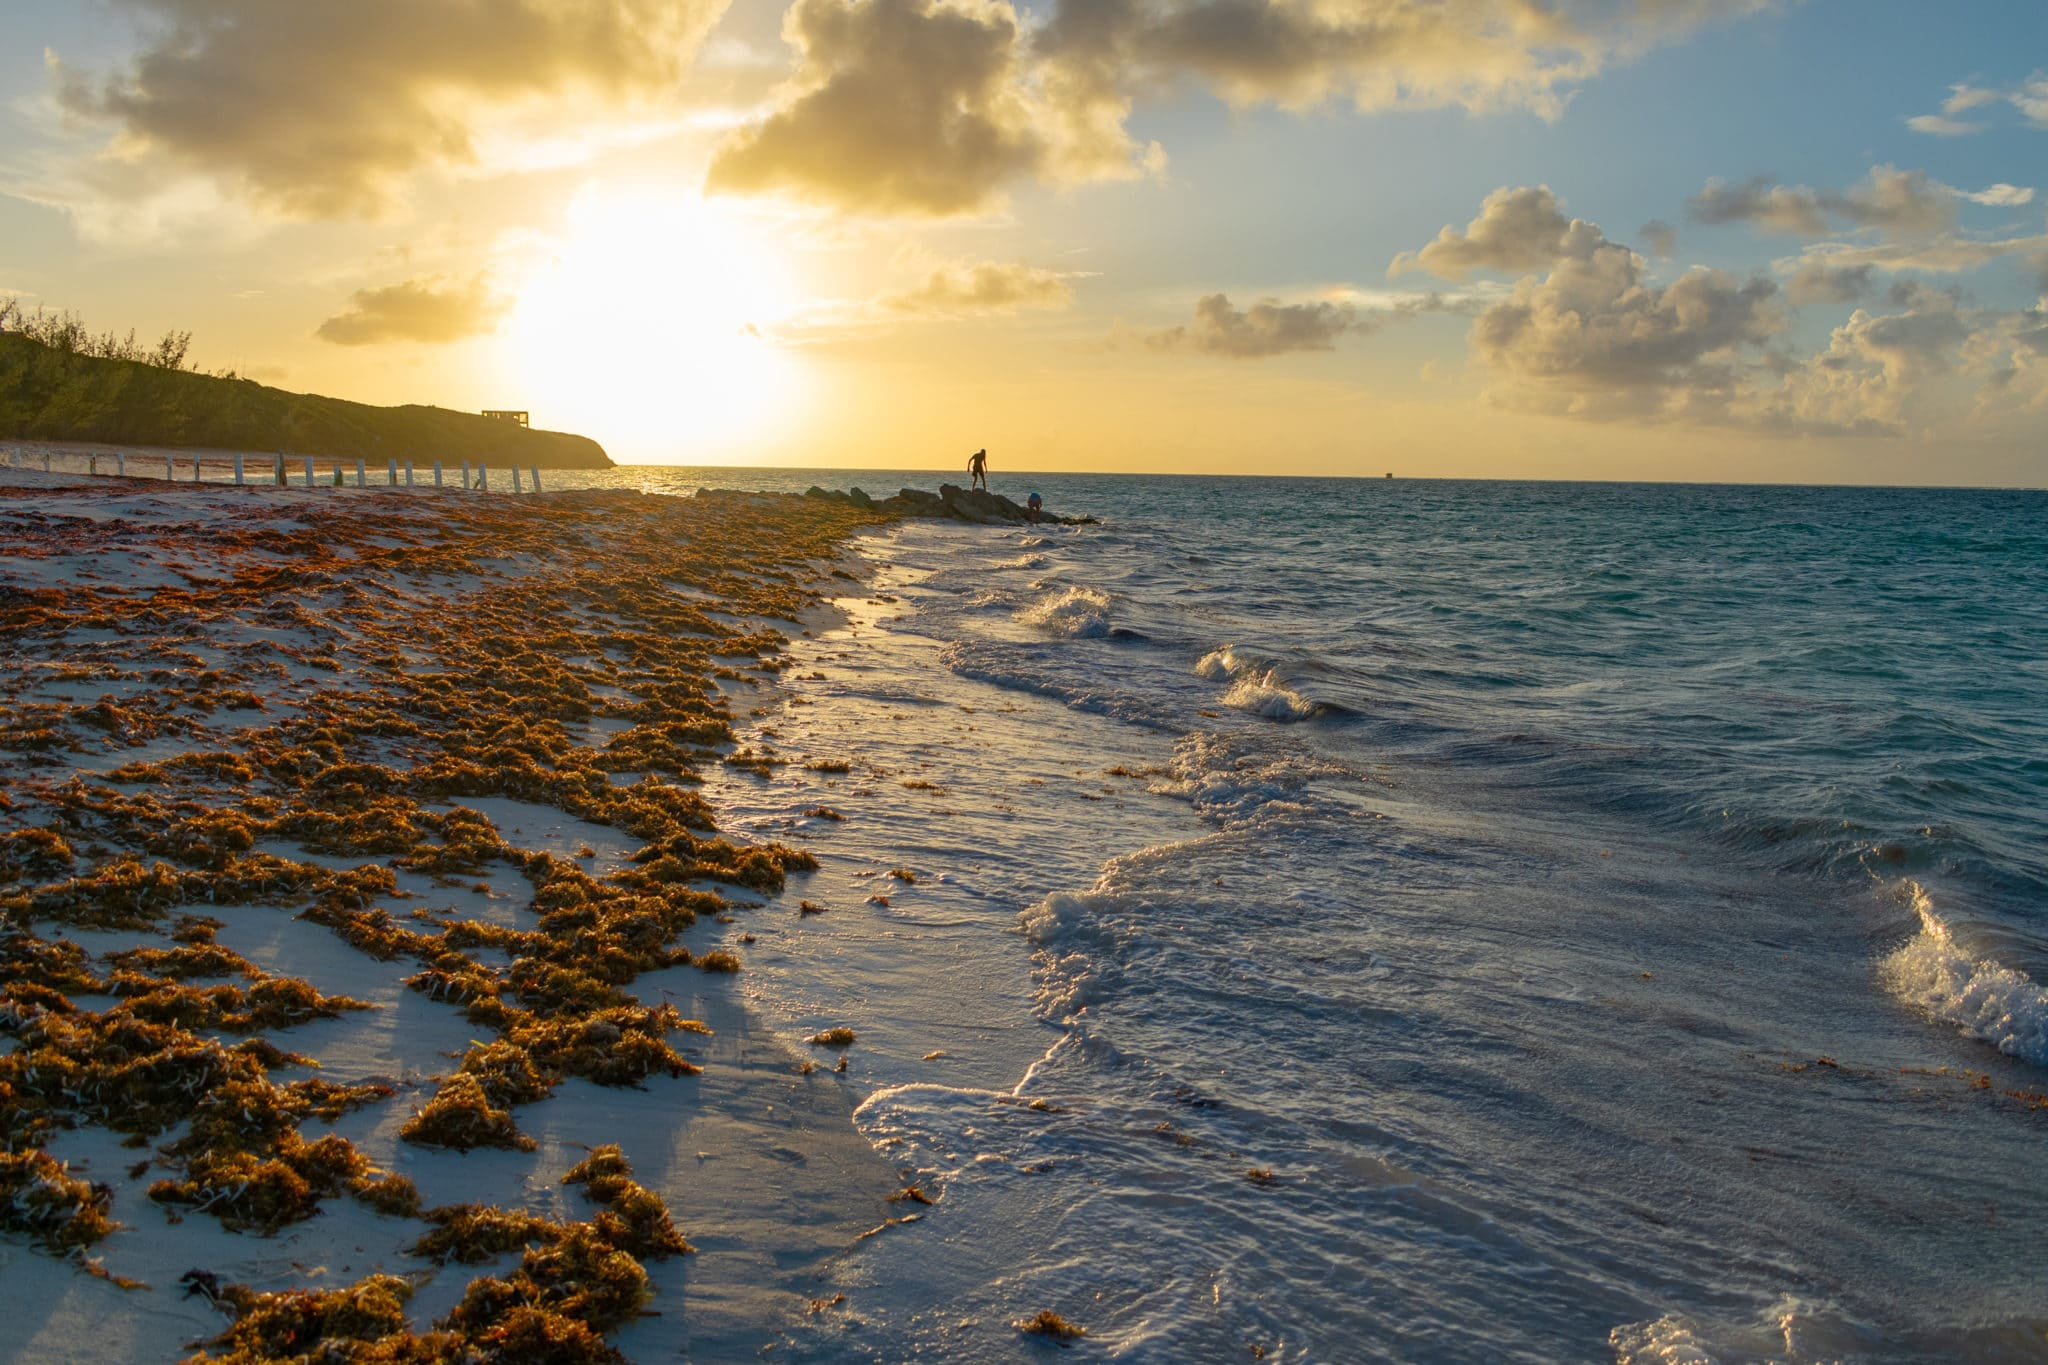 Whitby Beach Sunset, North Caicos